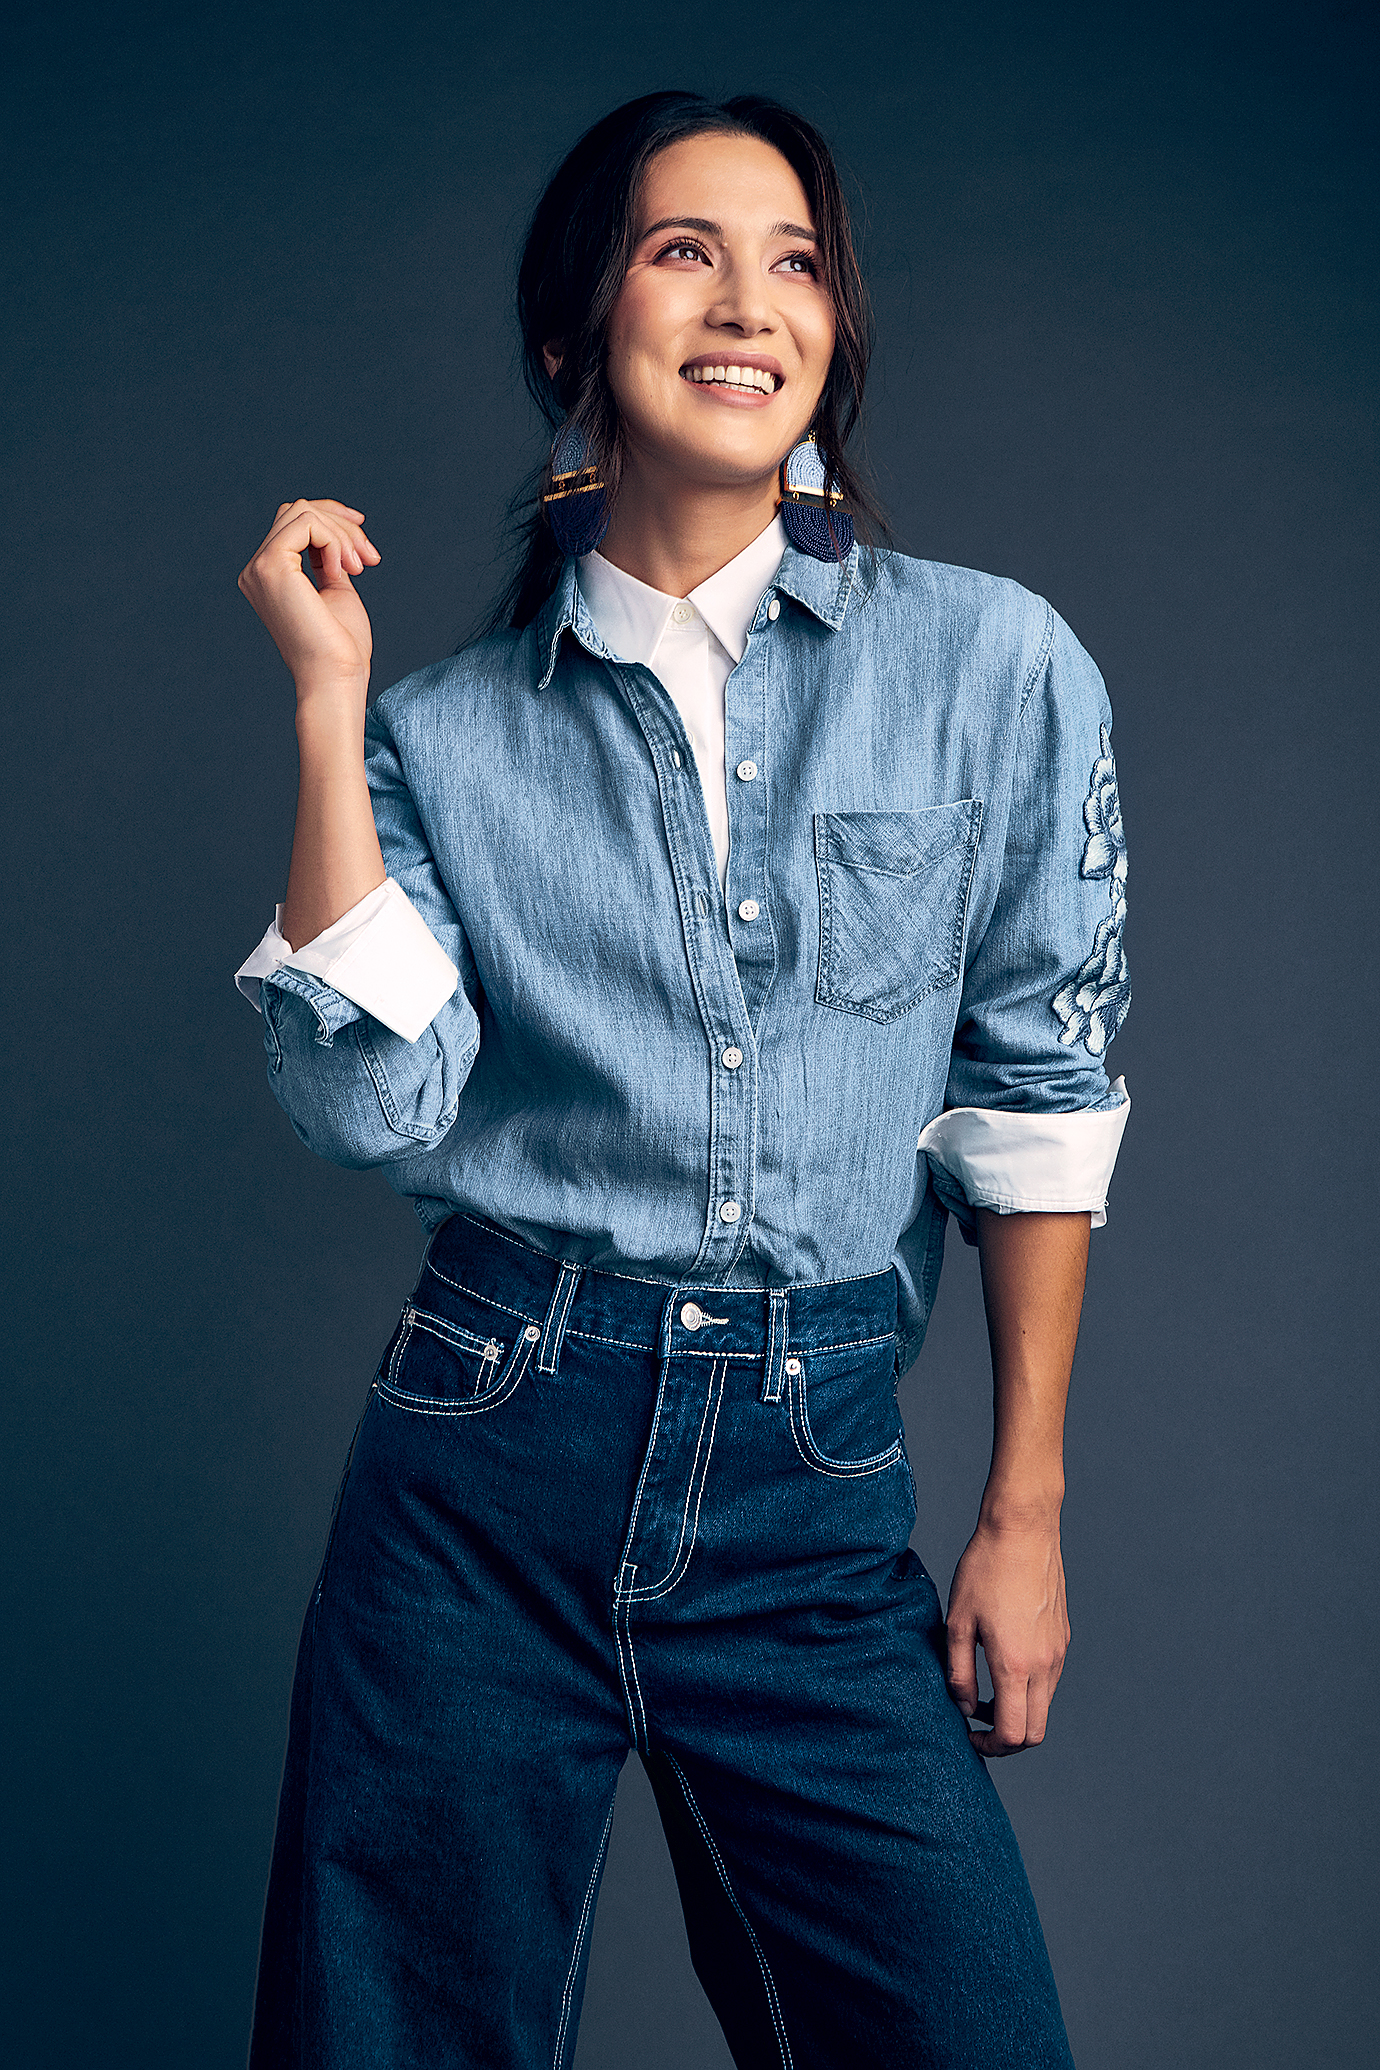 White shirt, $50 at the Gap; Rails blue denim shirt, $168 at Saks; jeans, $50 at Zara; pendant earrings, $185 at makua.co.